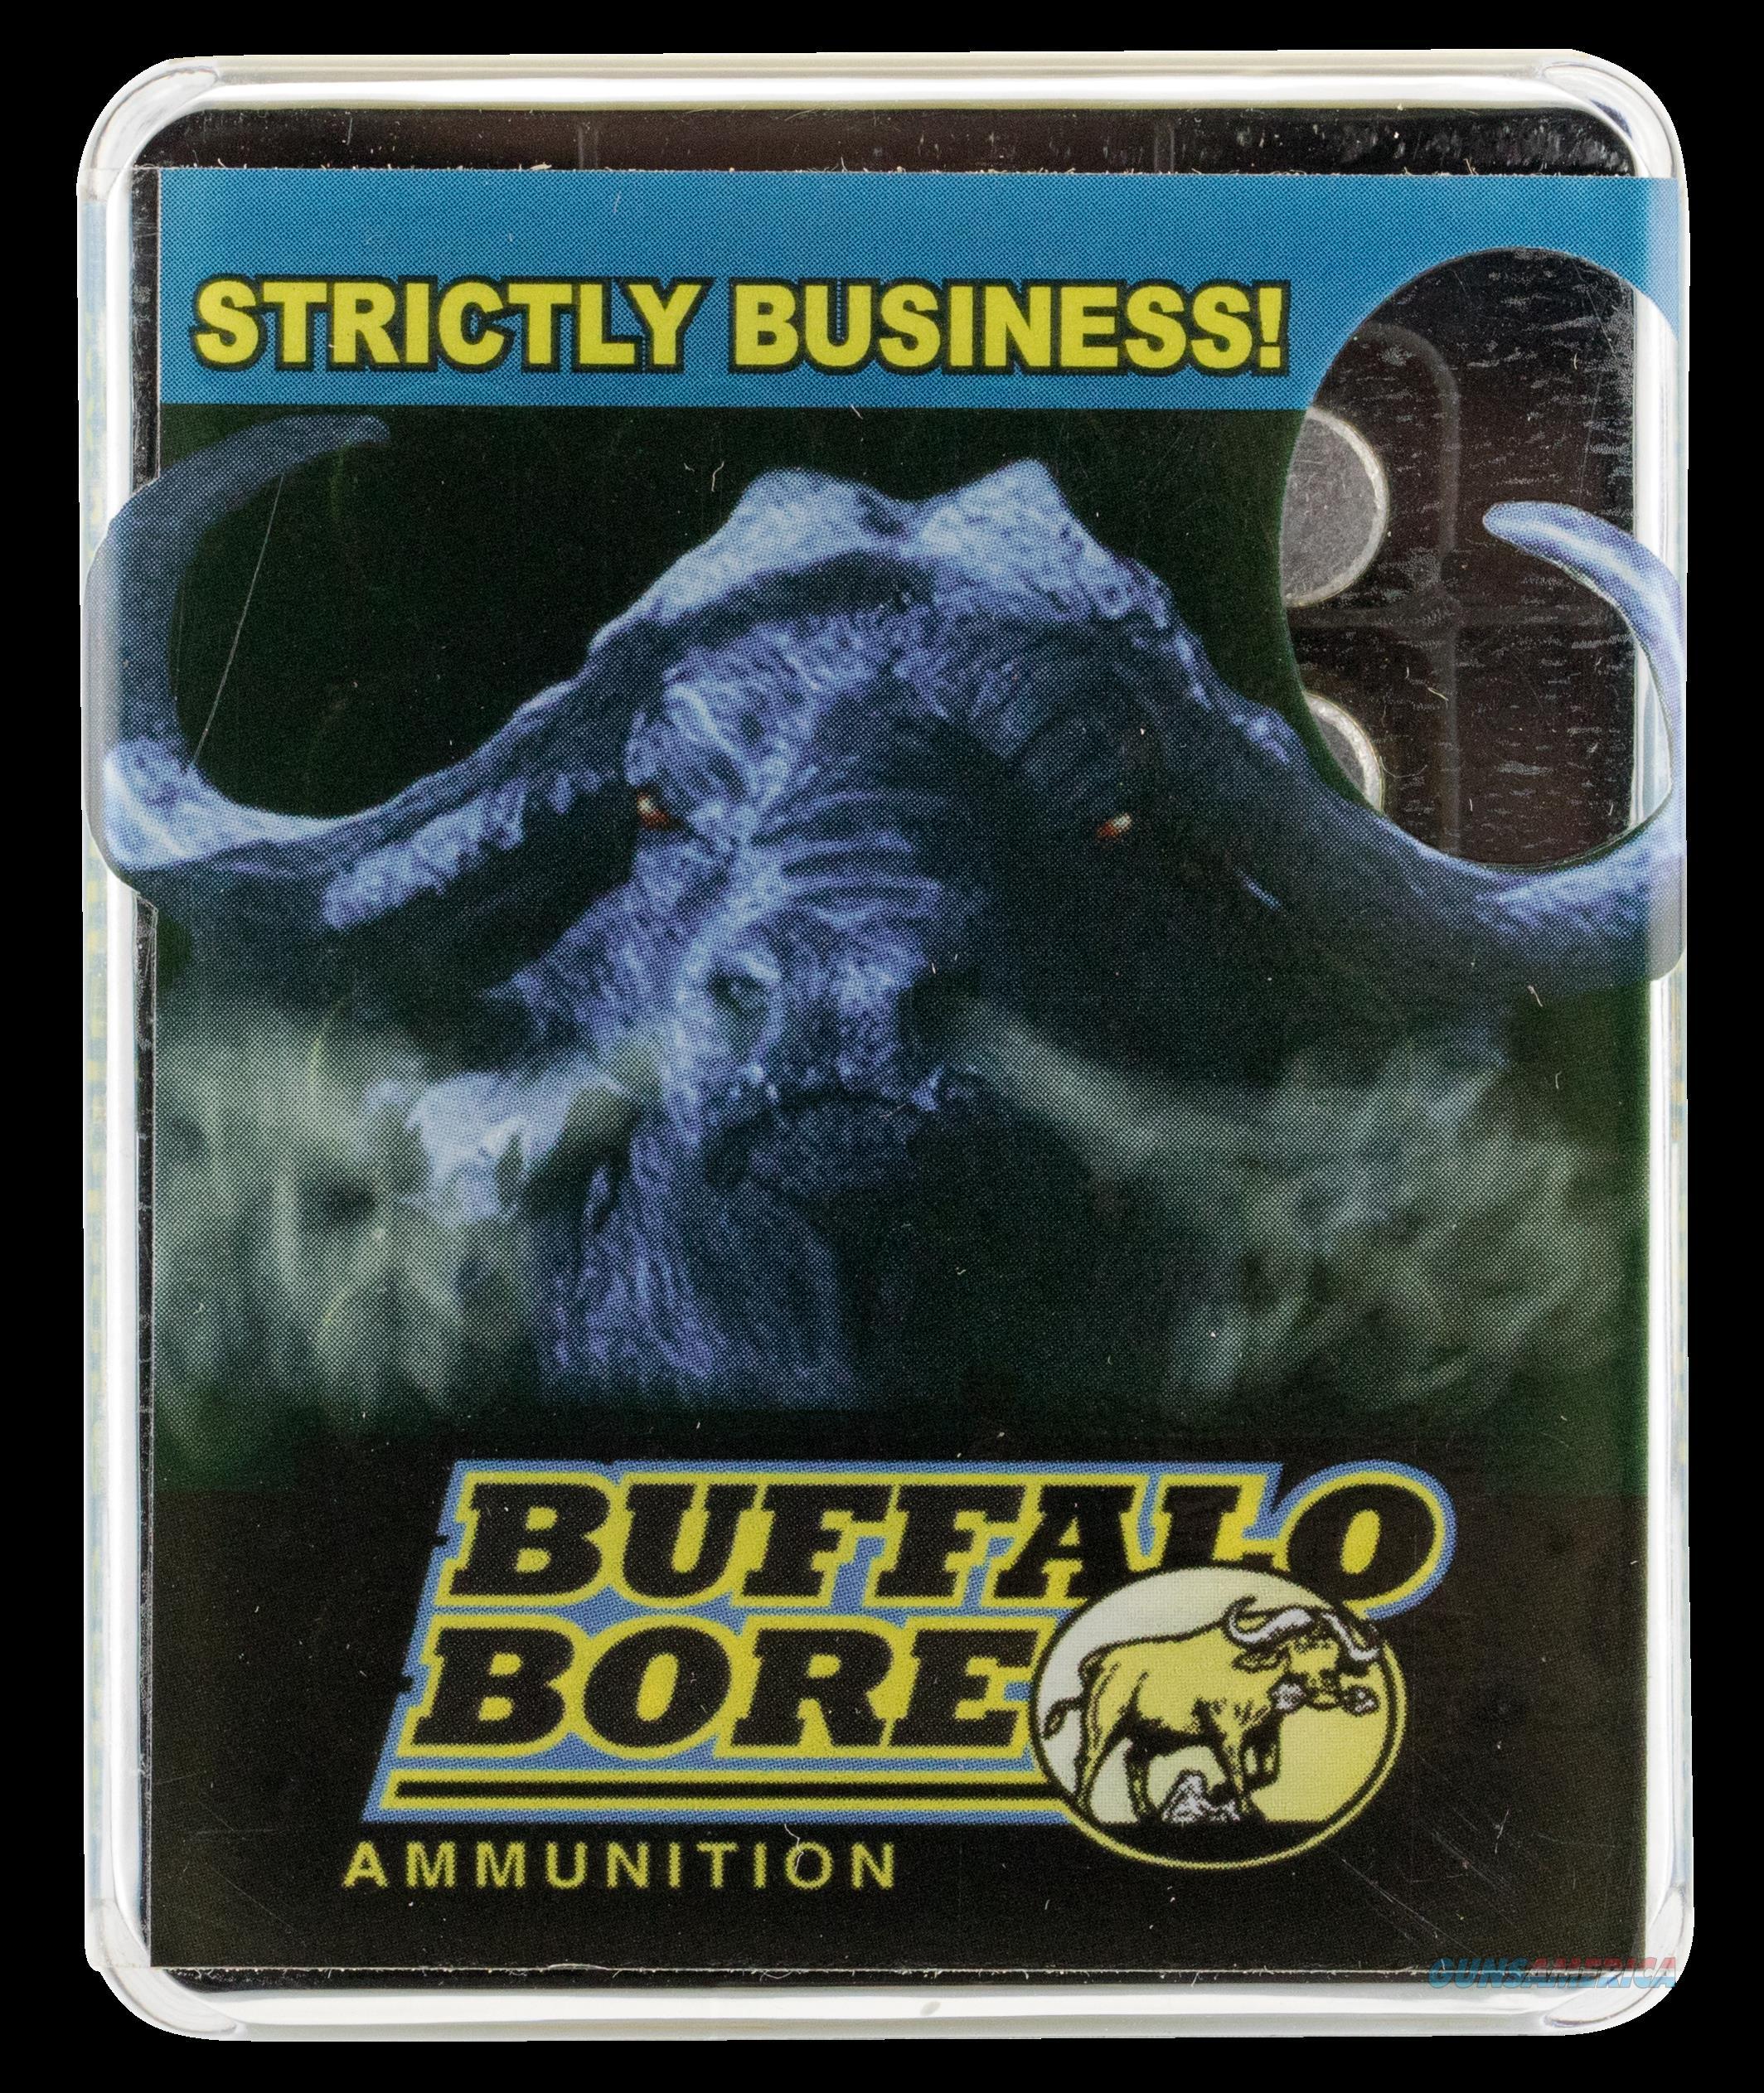 Buffalo Bore Ammunition Heavy, Bba 16b-20 41rm 230g Hrd Cst Swc 20-12  Guns > Pistols > 1911 Pistol Copies (non-Colt)